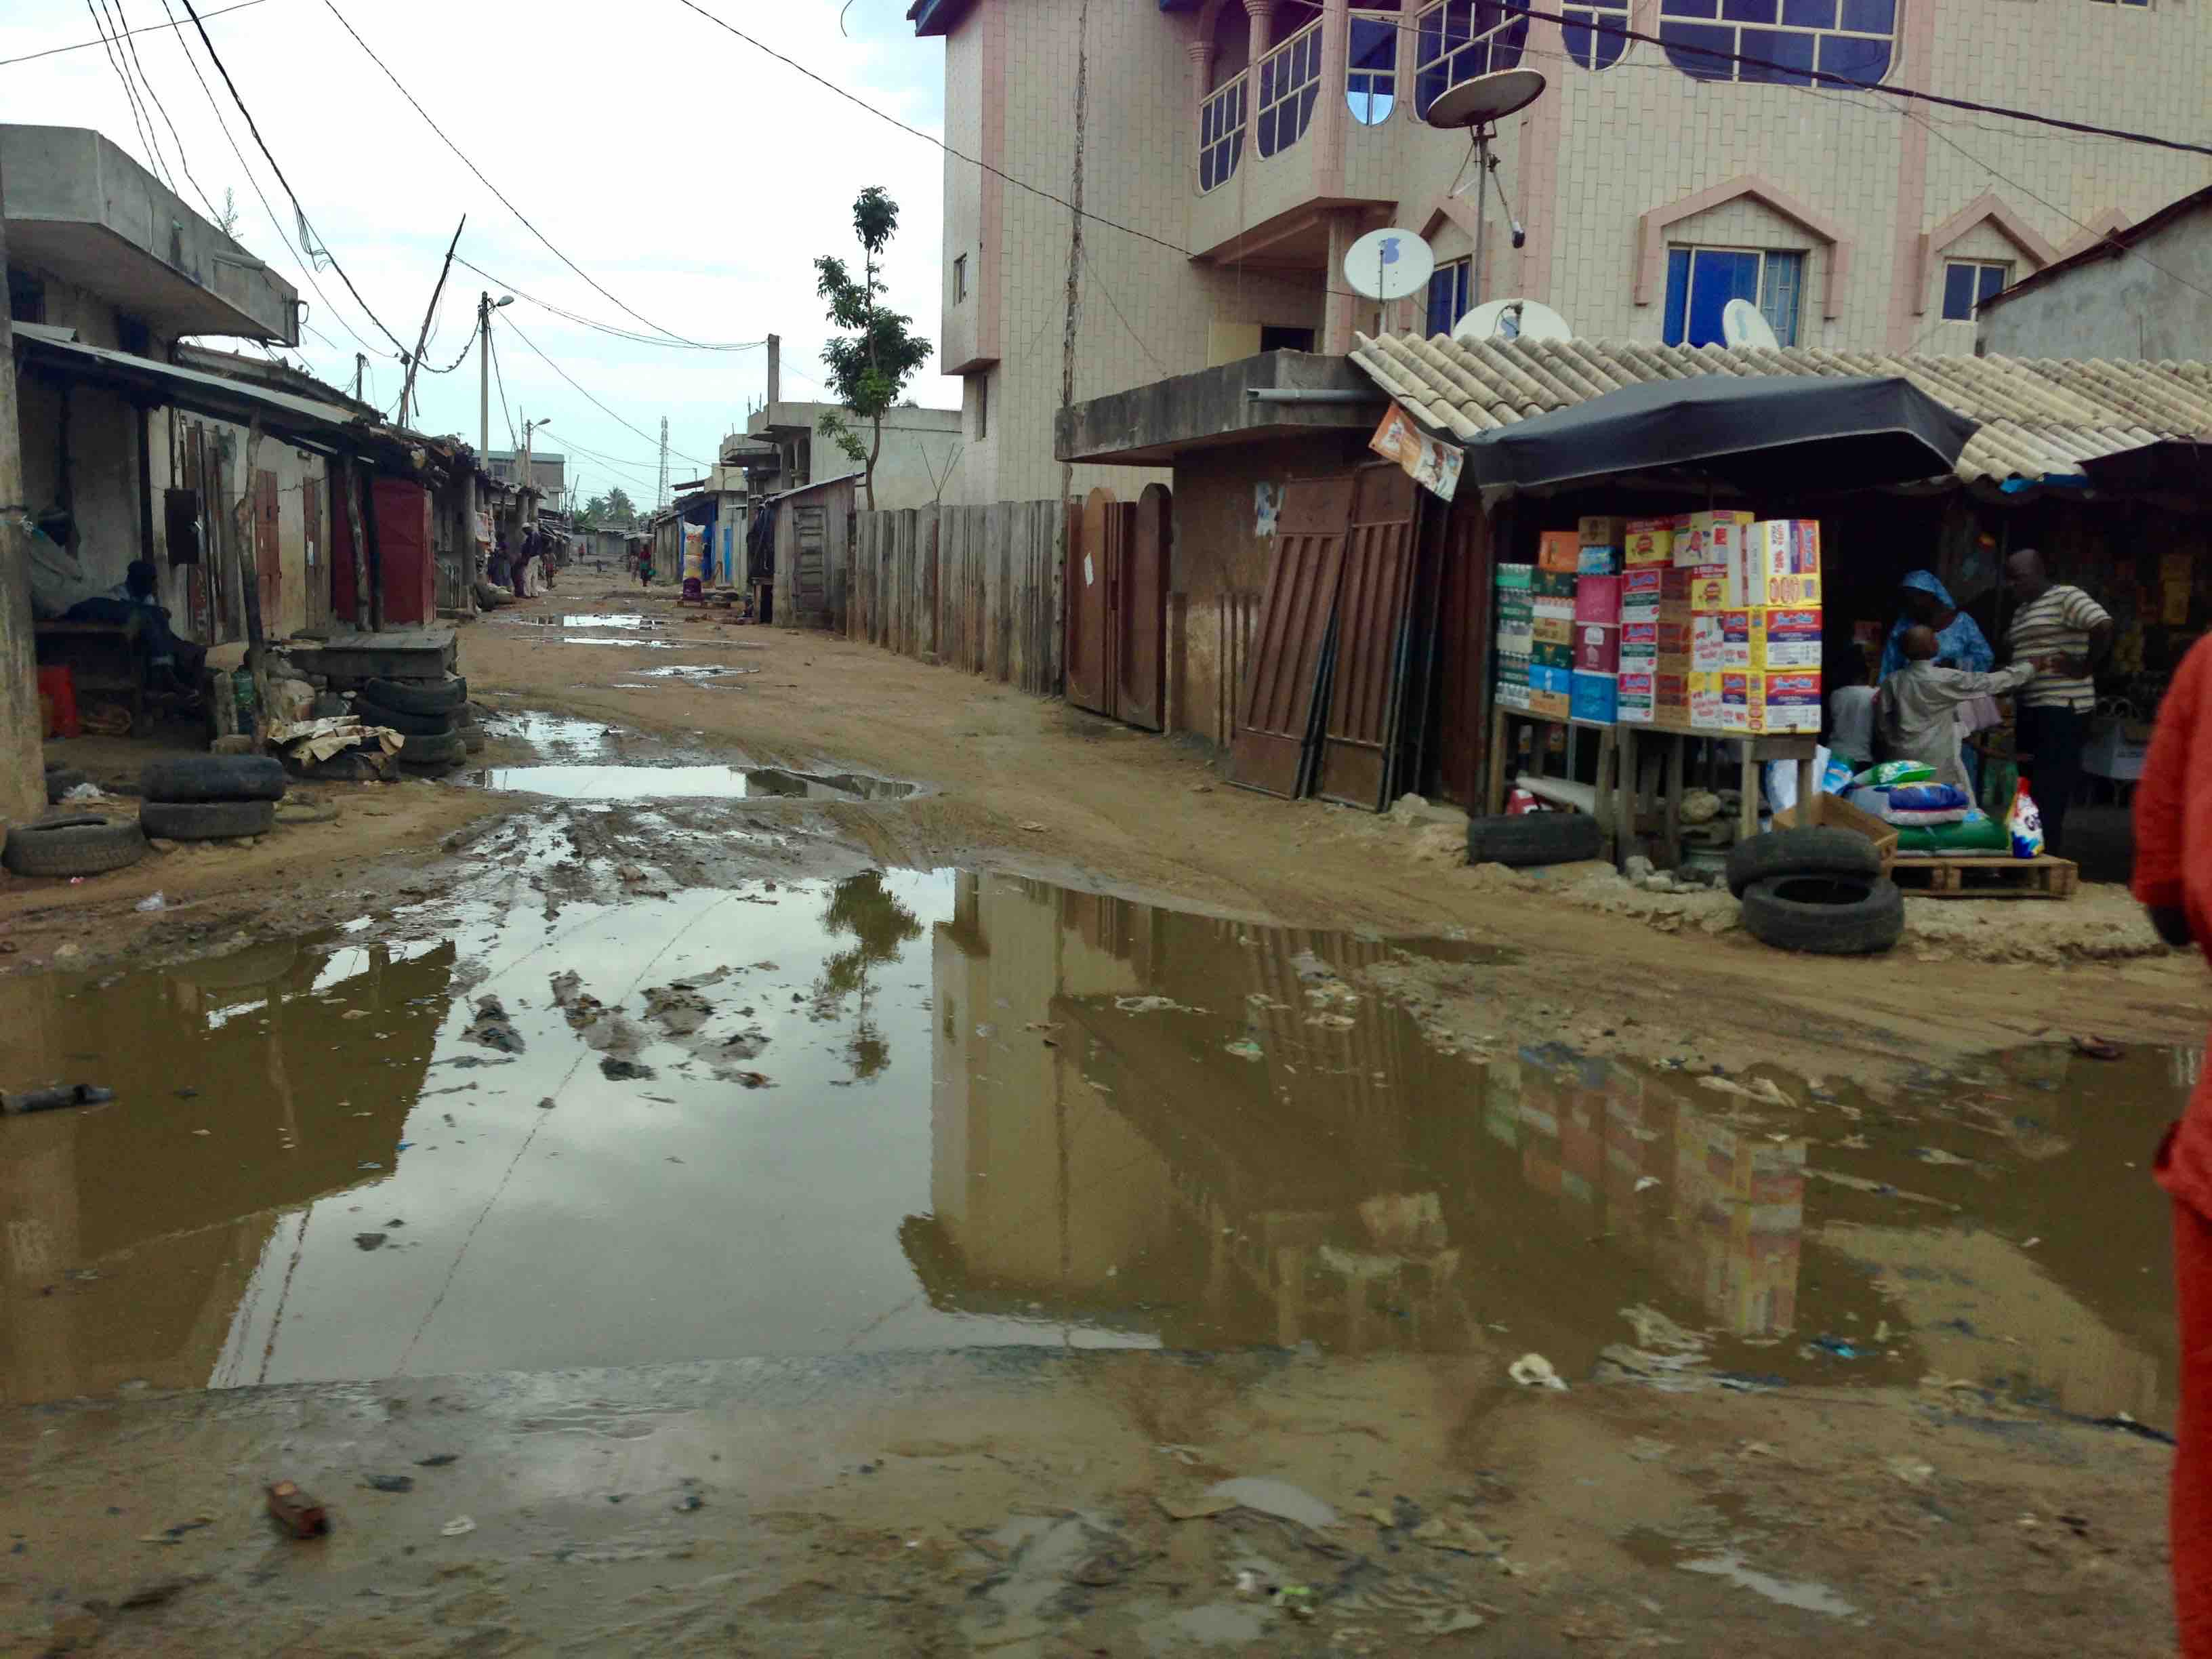 Seme border, Queme, Benin. #JujuFilms